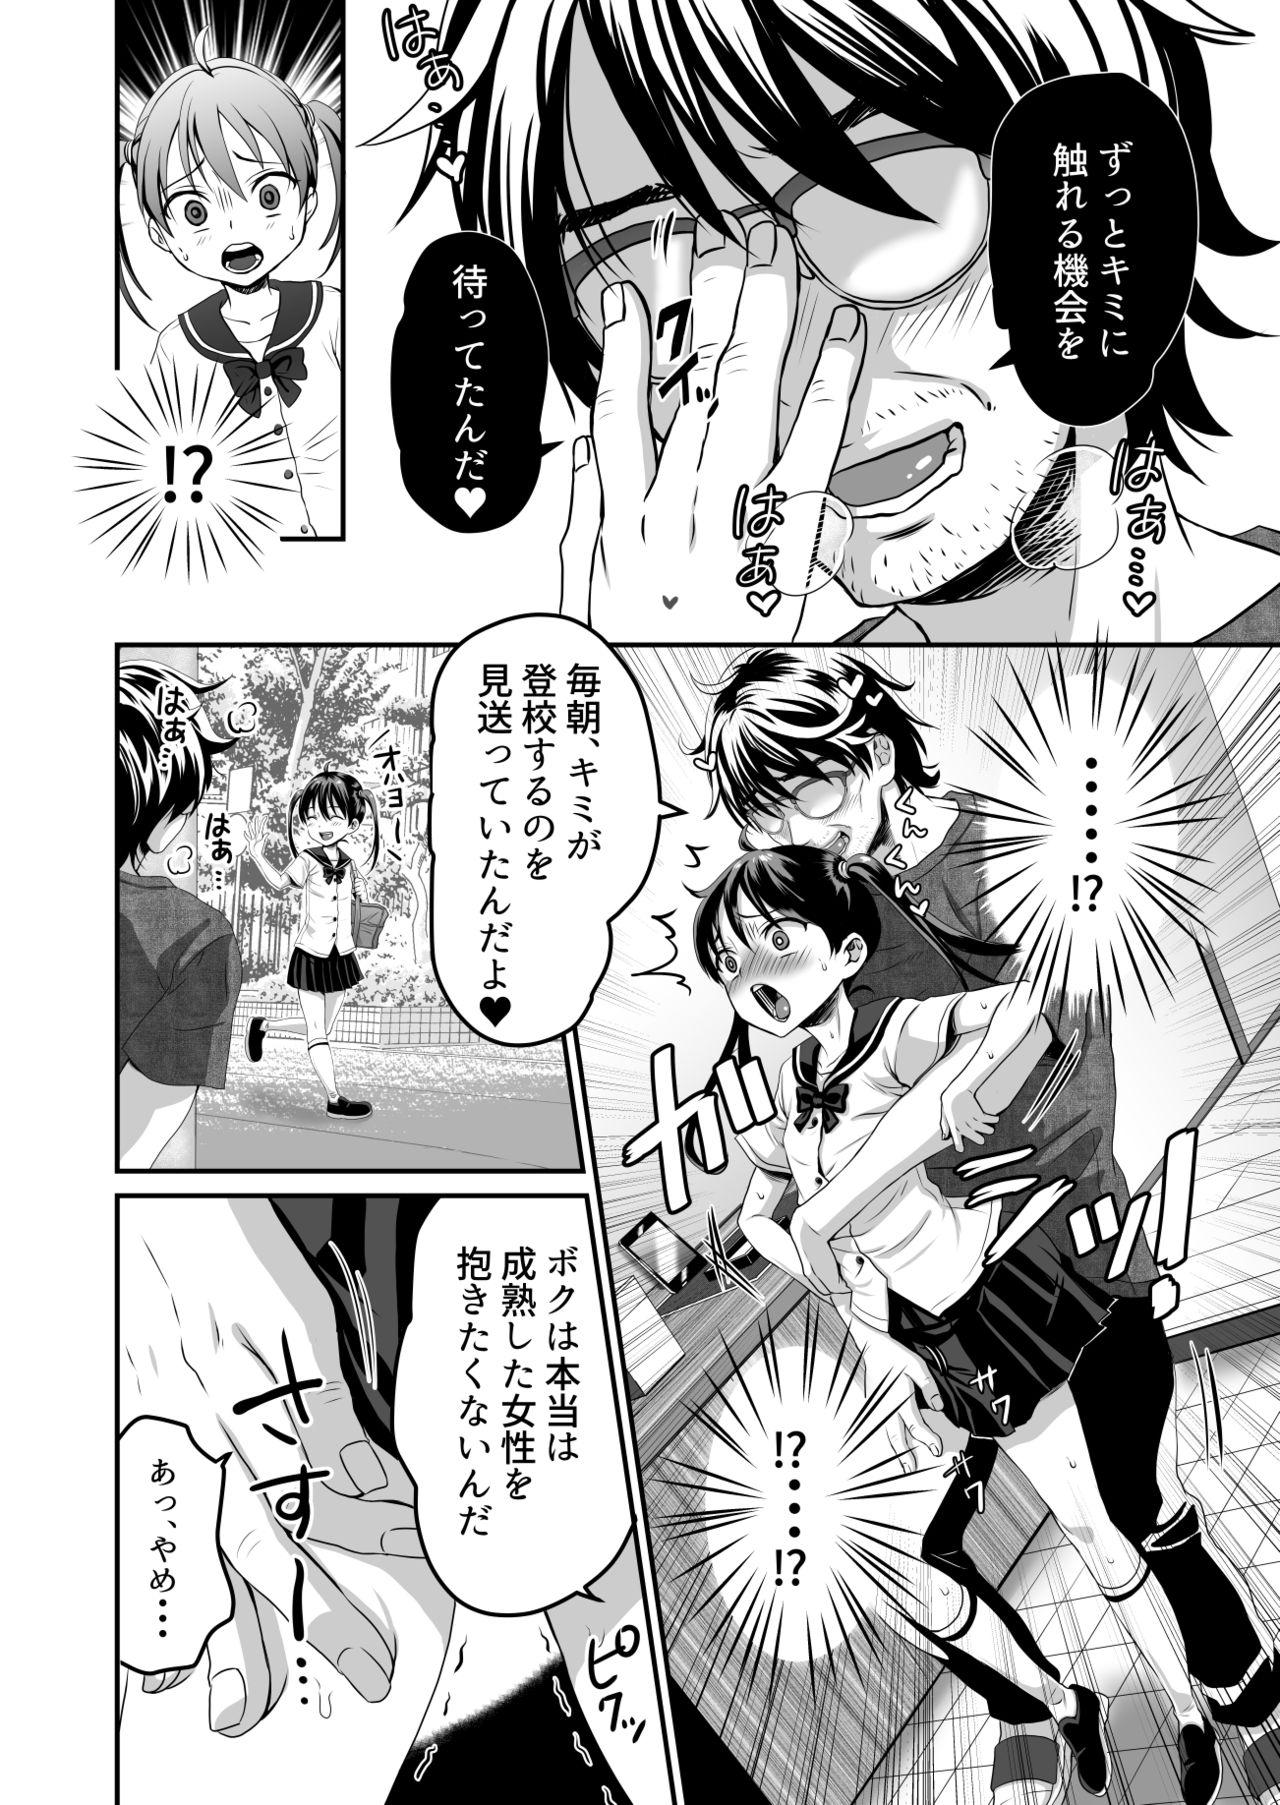 Otonari-san wa AV Danyuu 10